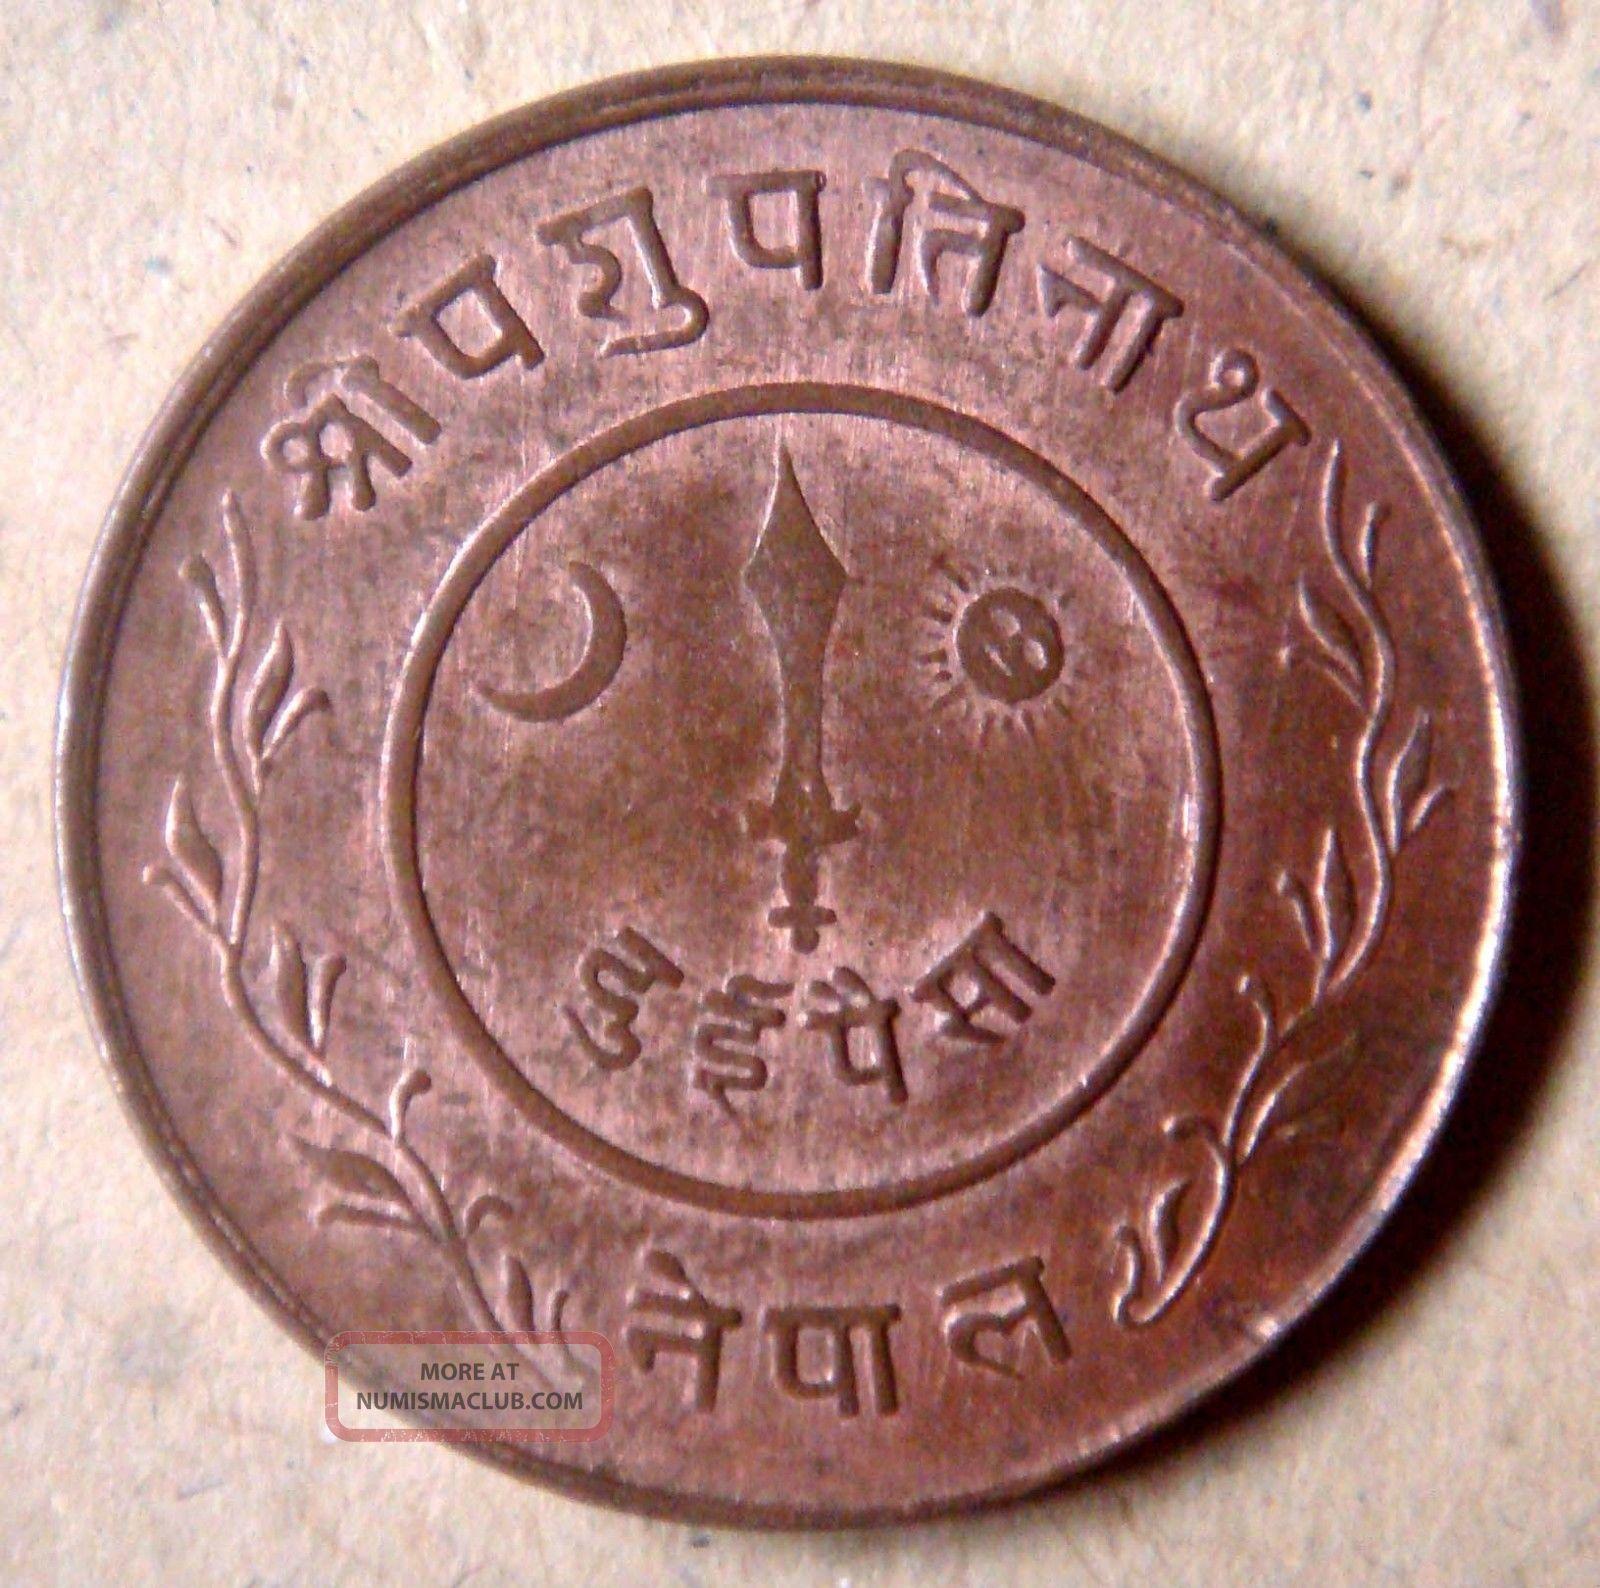 Nepal : 2 Paisa Copper Coin, 1940 Ad, King Tribhuvan, Km ...